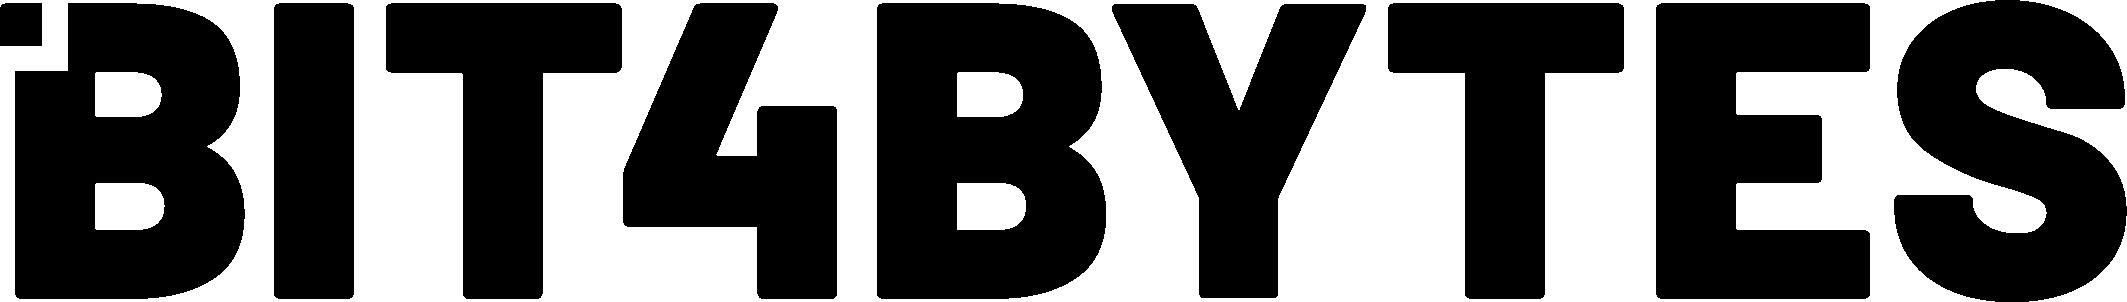 Bit4bytes logo